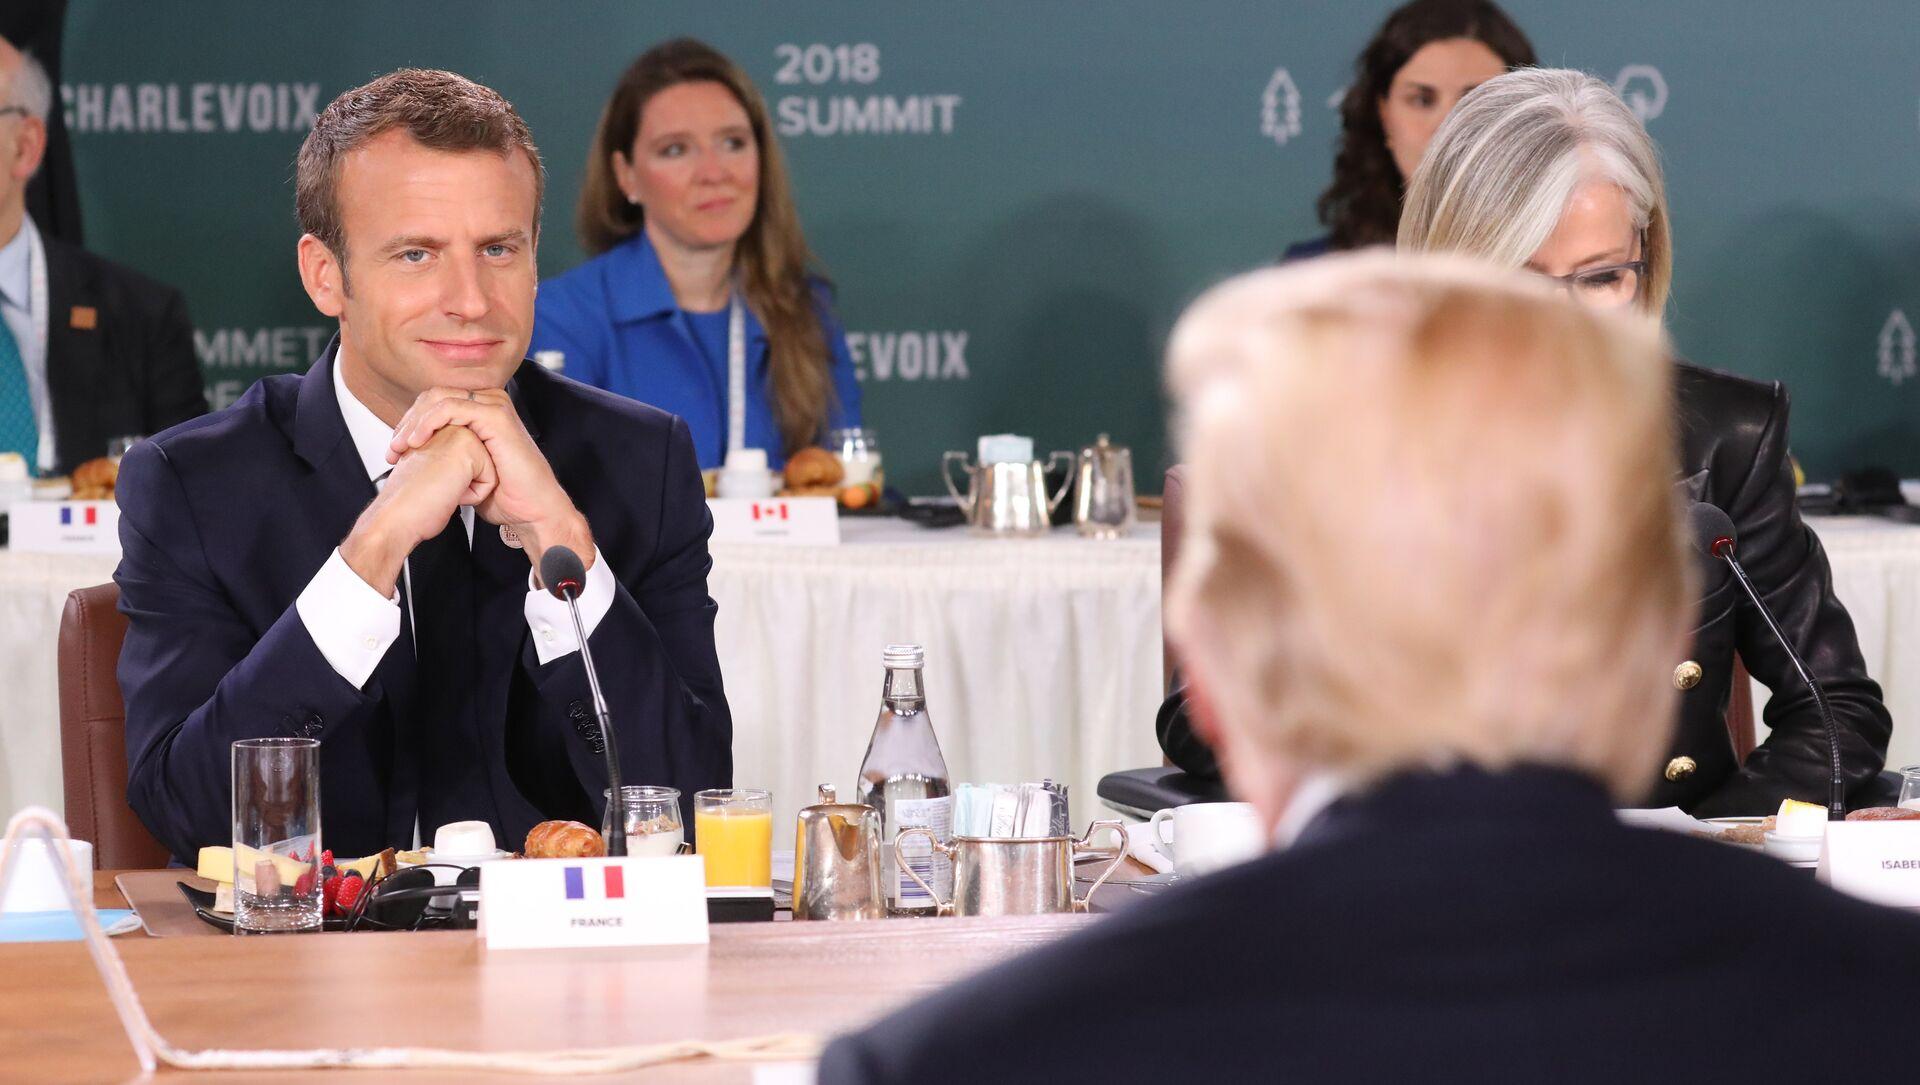 Emmanuel Macron, presidente de Francia - Sputnik Mundo, 1920, 07.11.2018